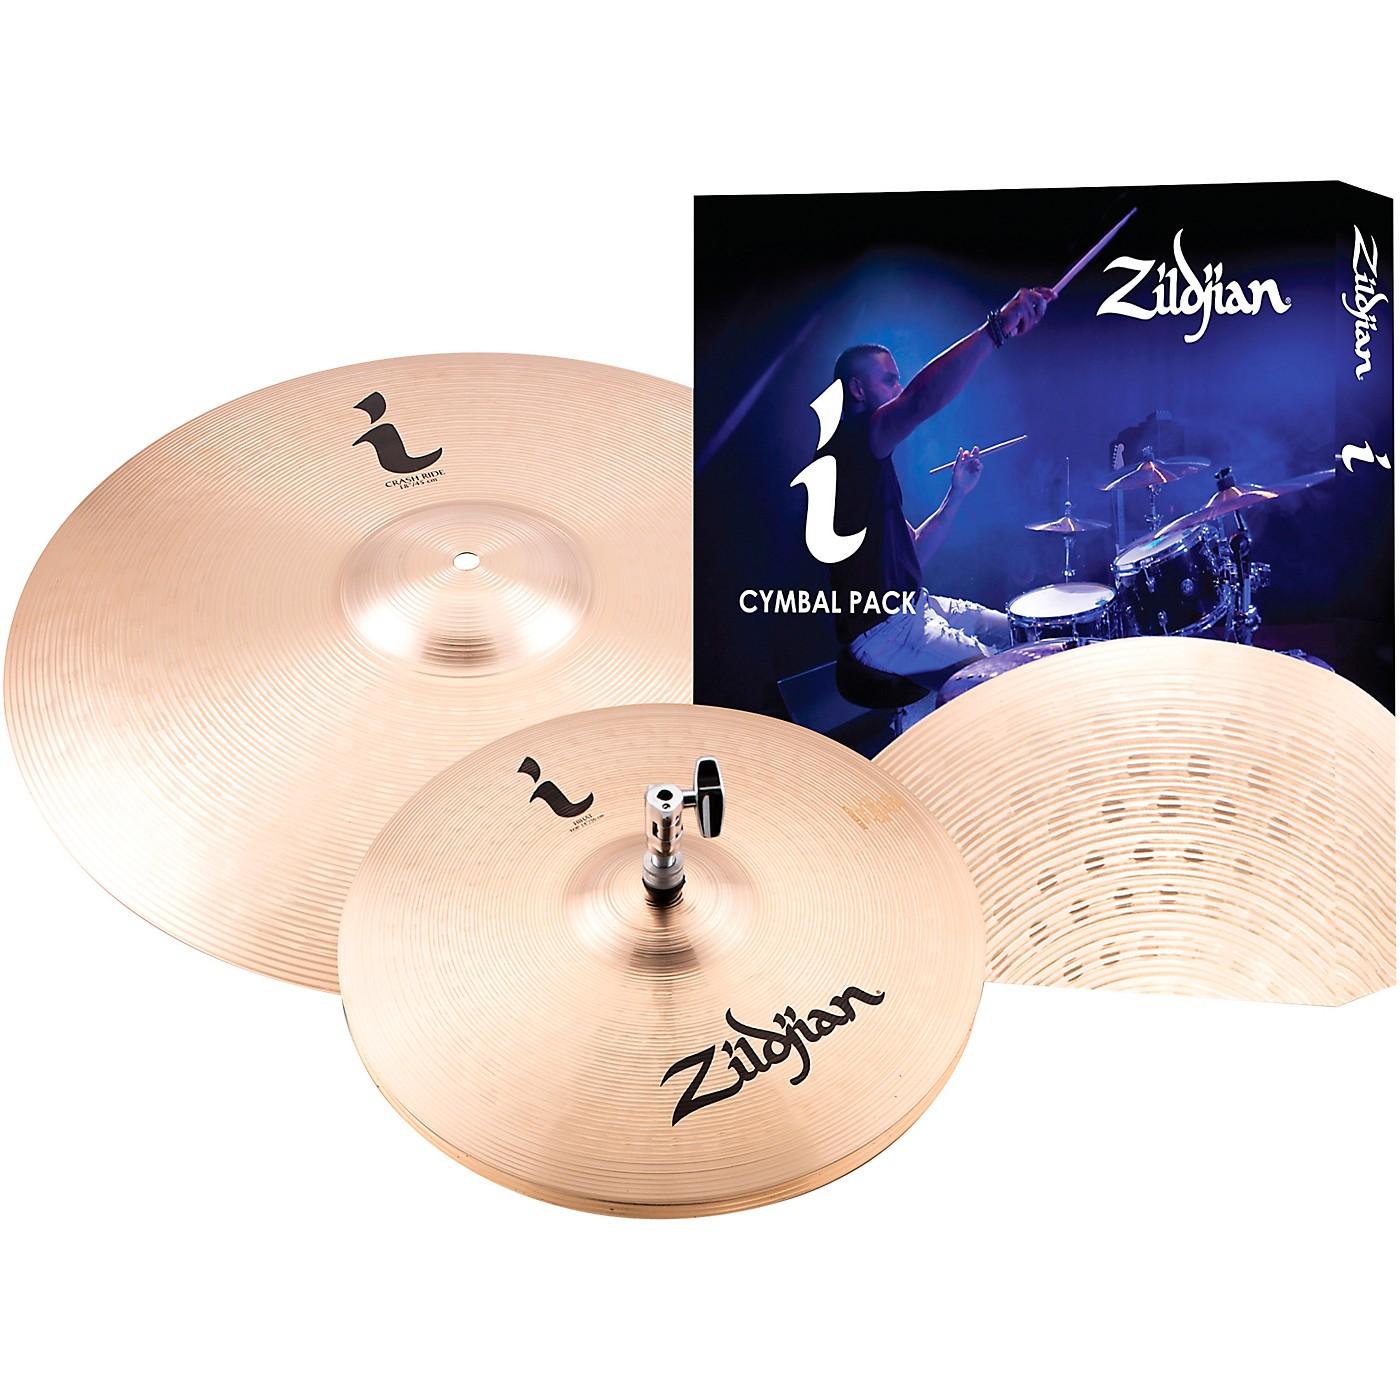 Zildjian I Series Cymbal Set thumbnail